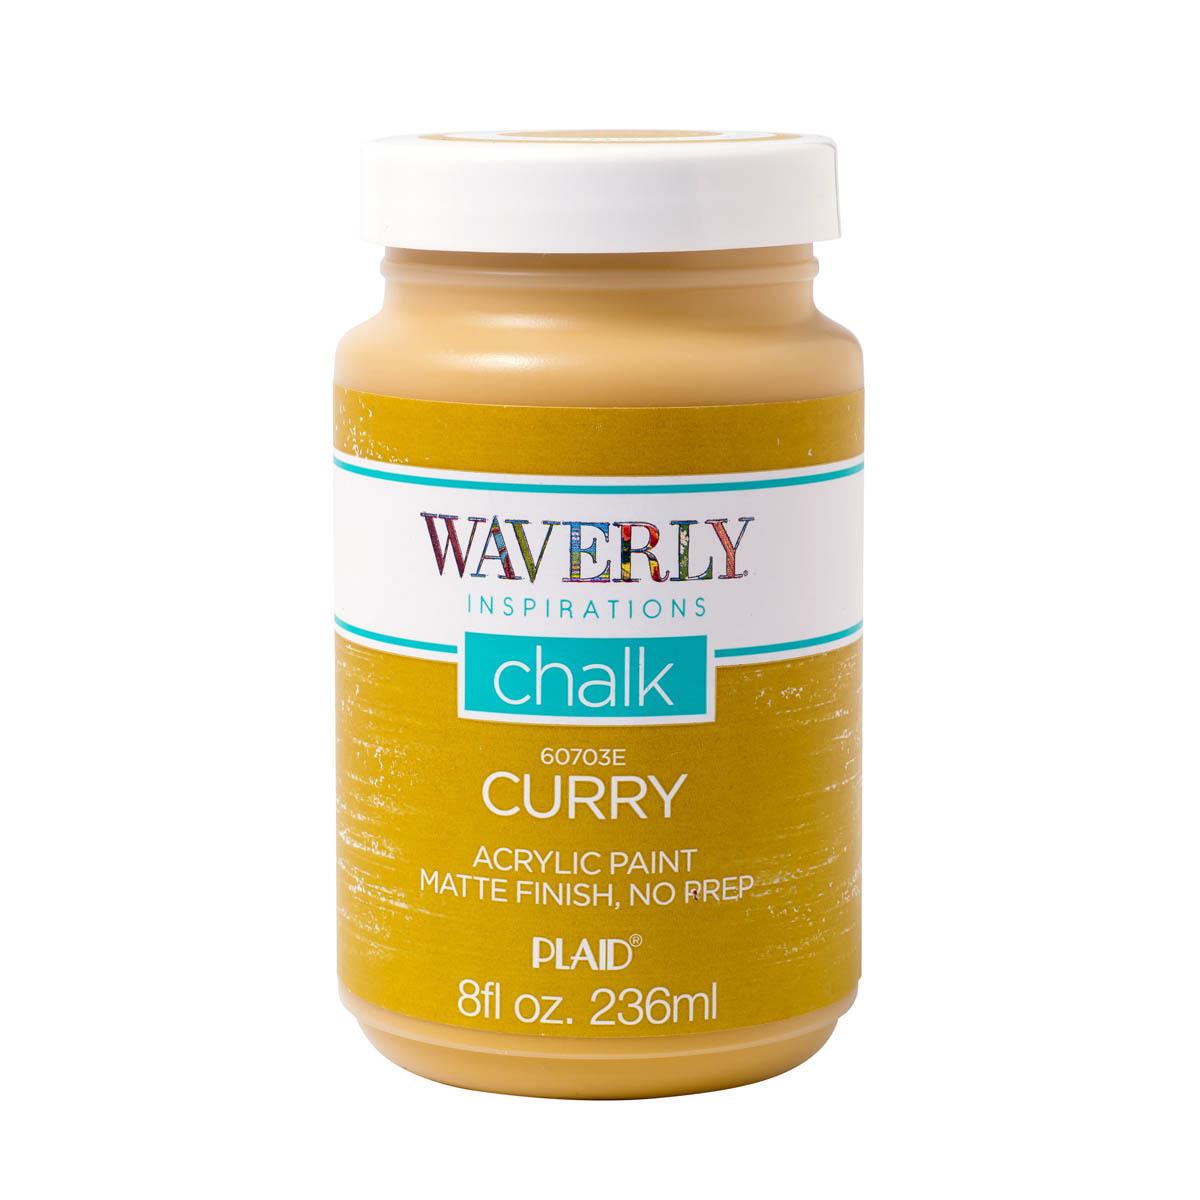 Waverly ® Inspirations Chalk Acrylic Paint - Curry, 8 oz.